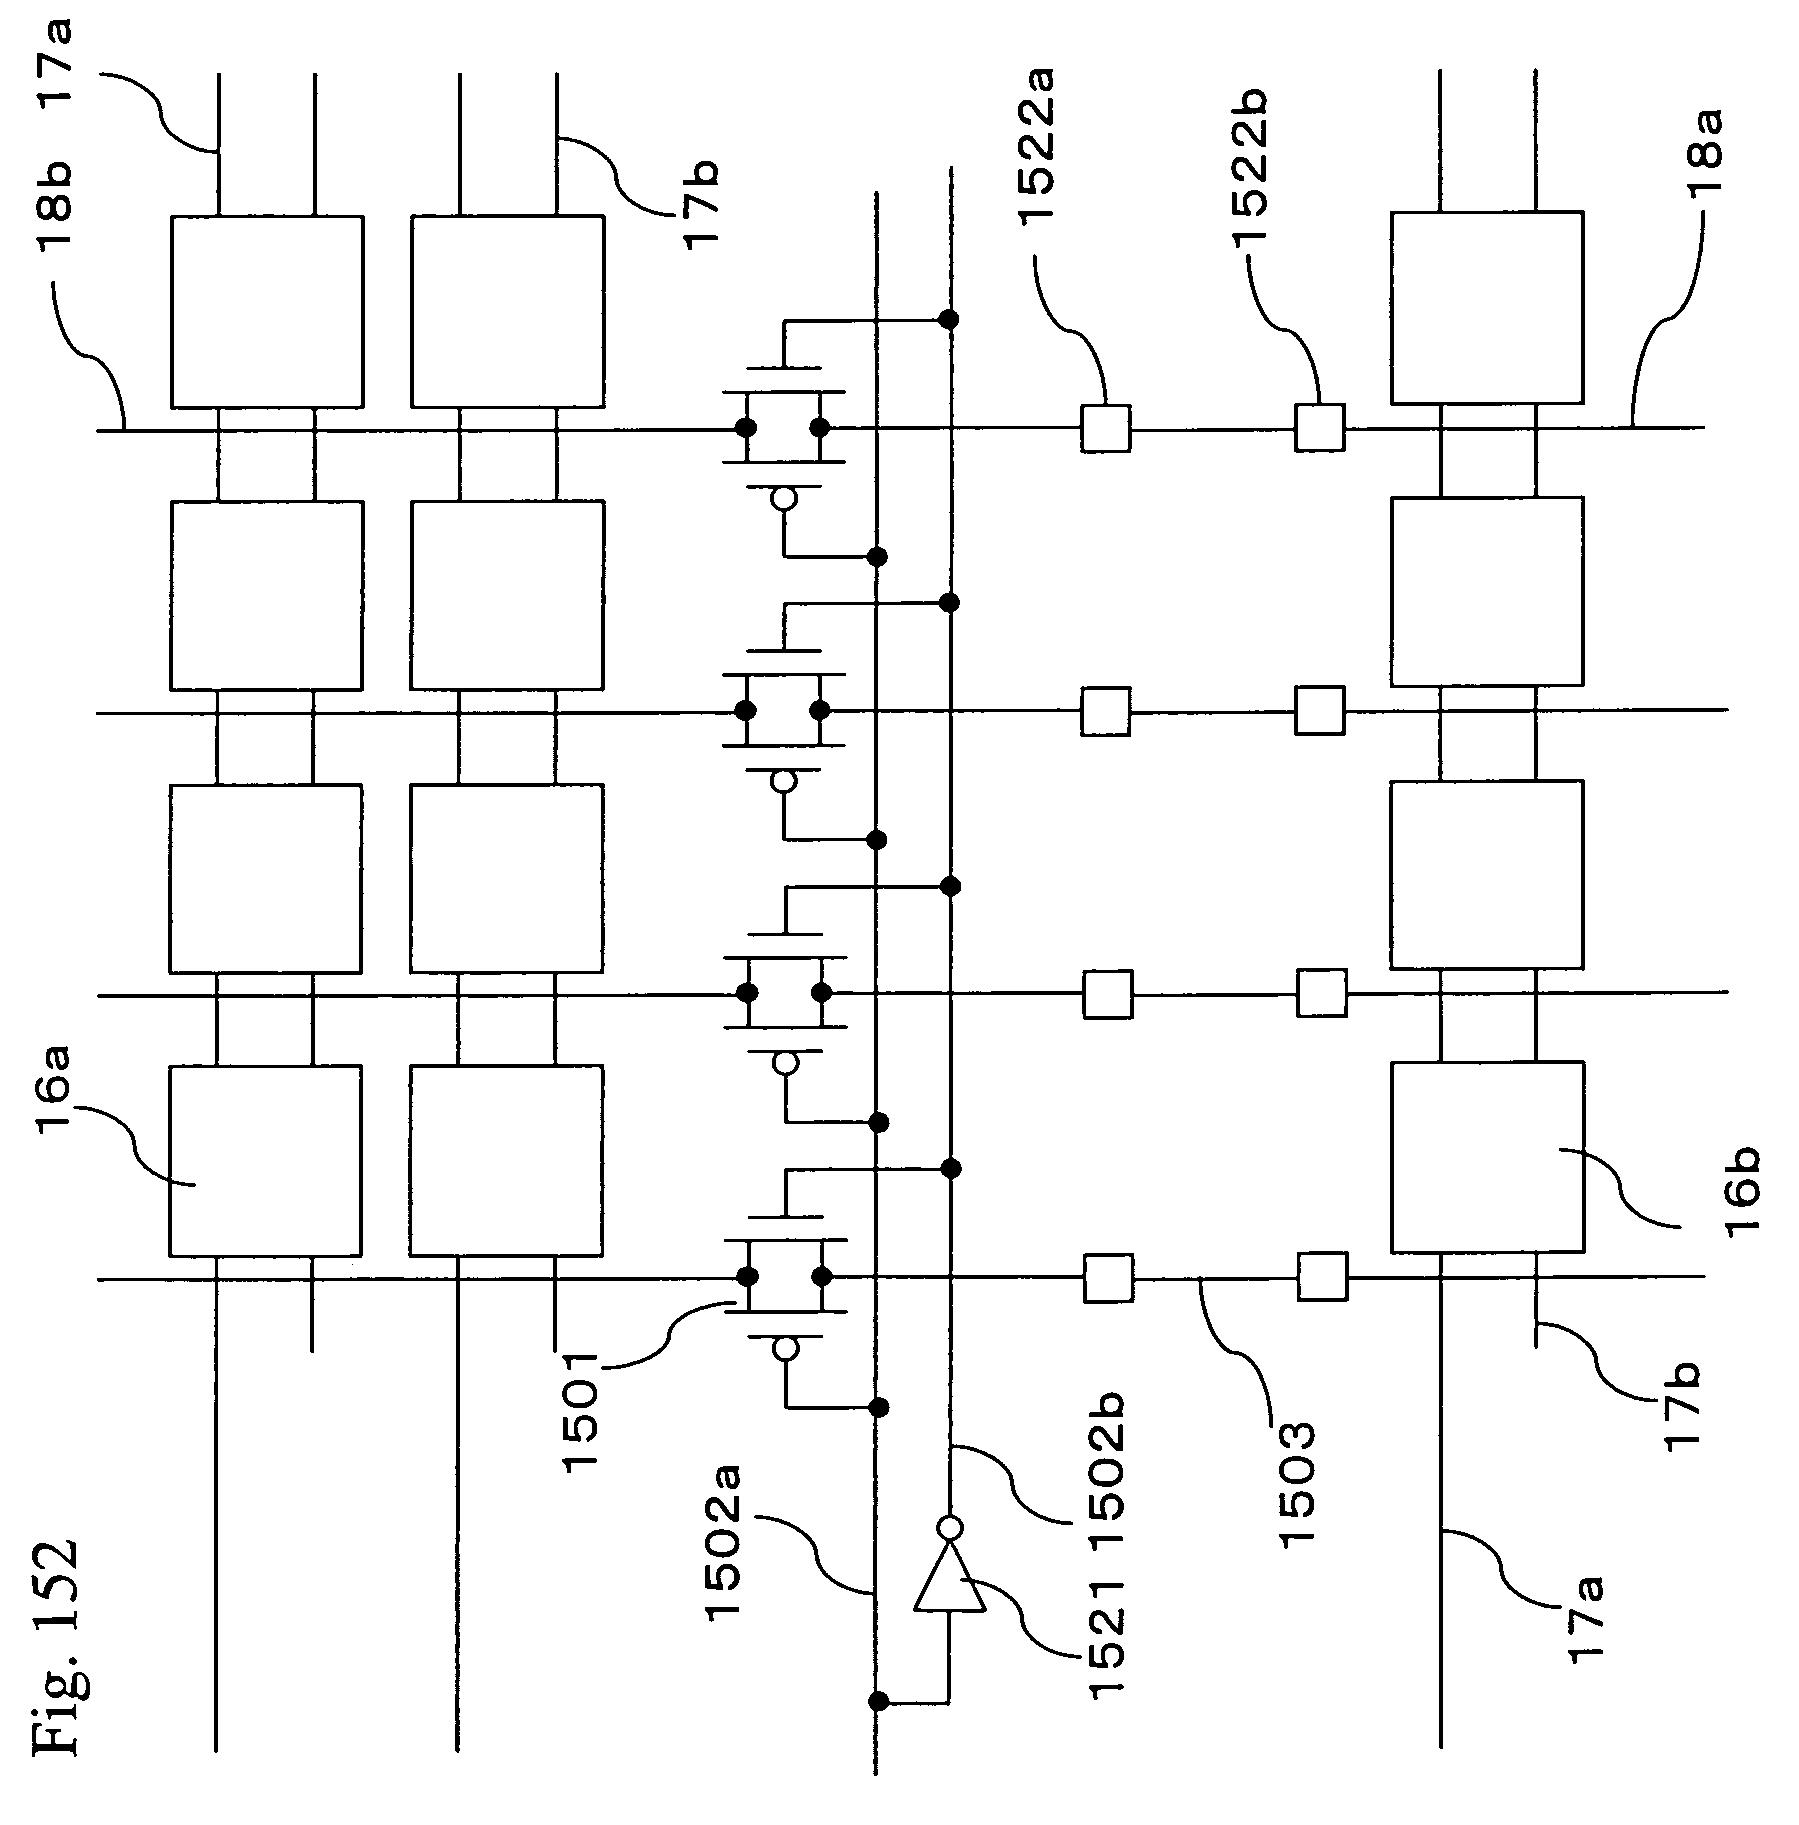 Patent US 7,742,019 B2